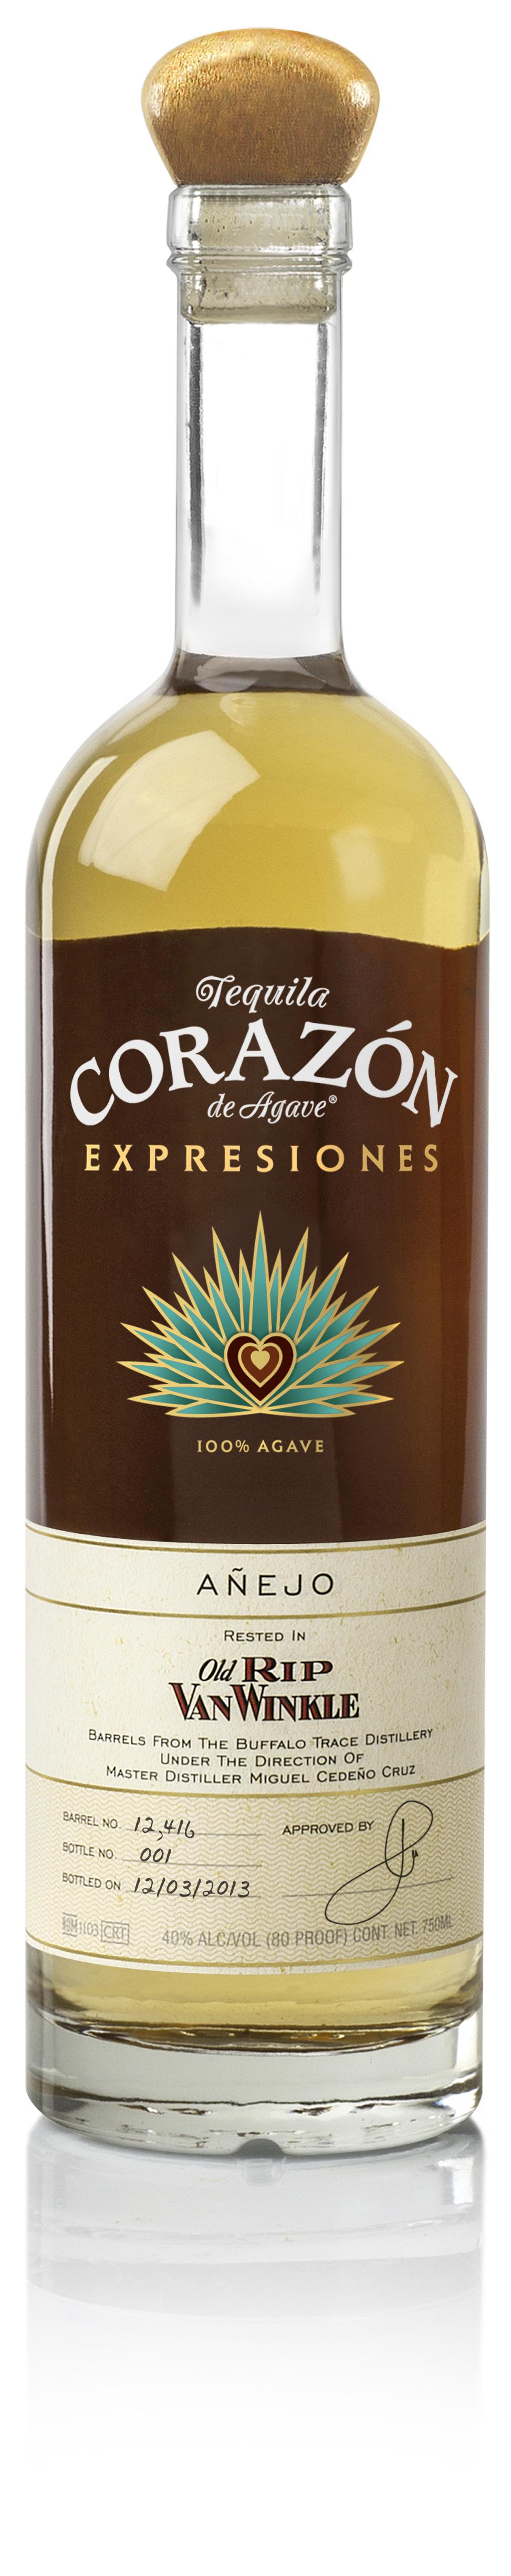 Expresiones del Corazon Old Rip Van Winkle Anejo